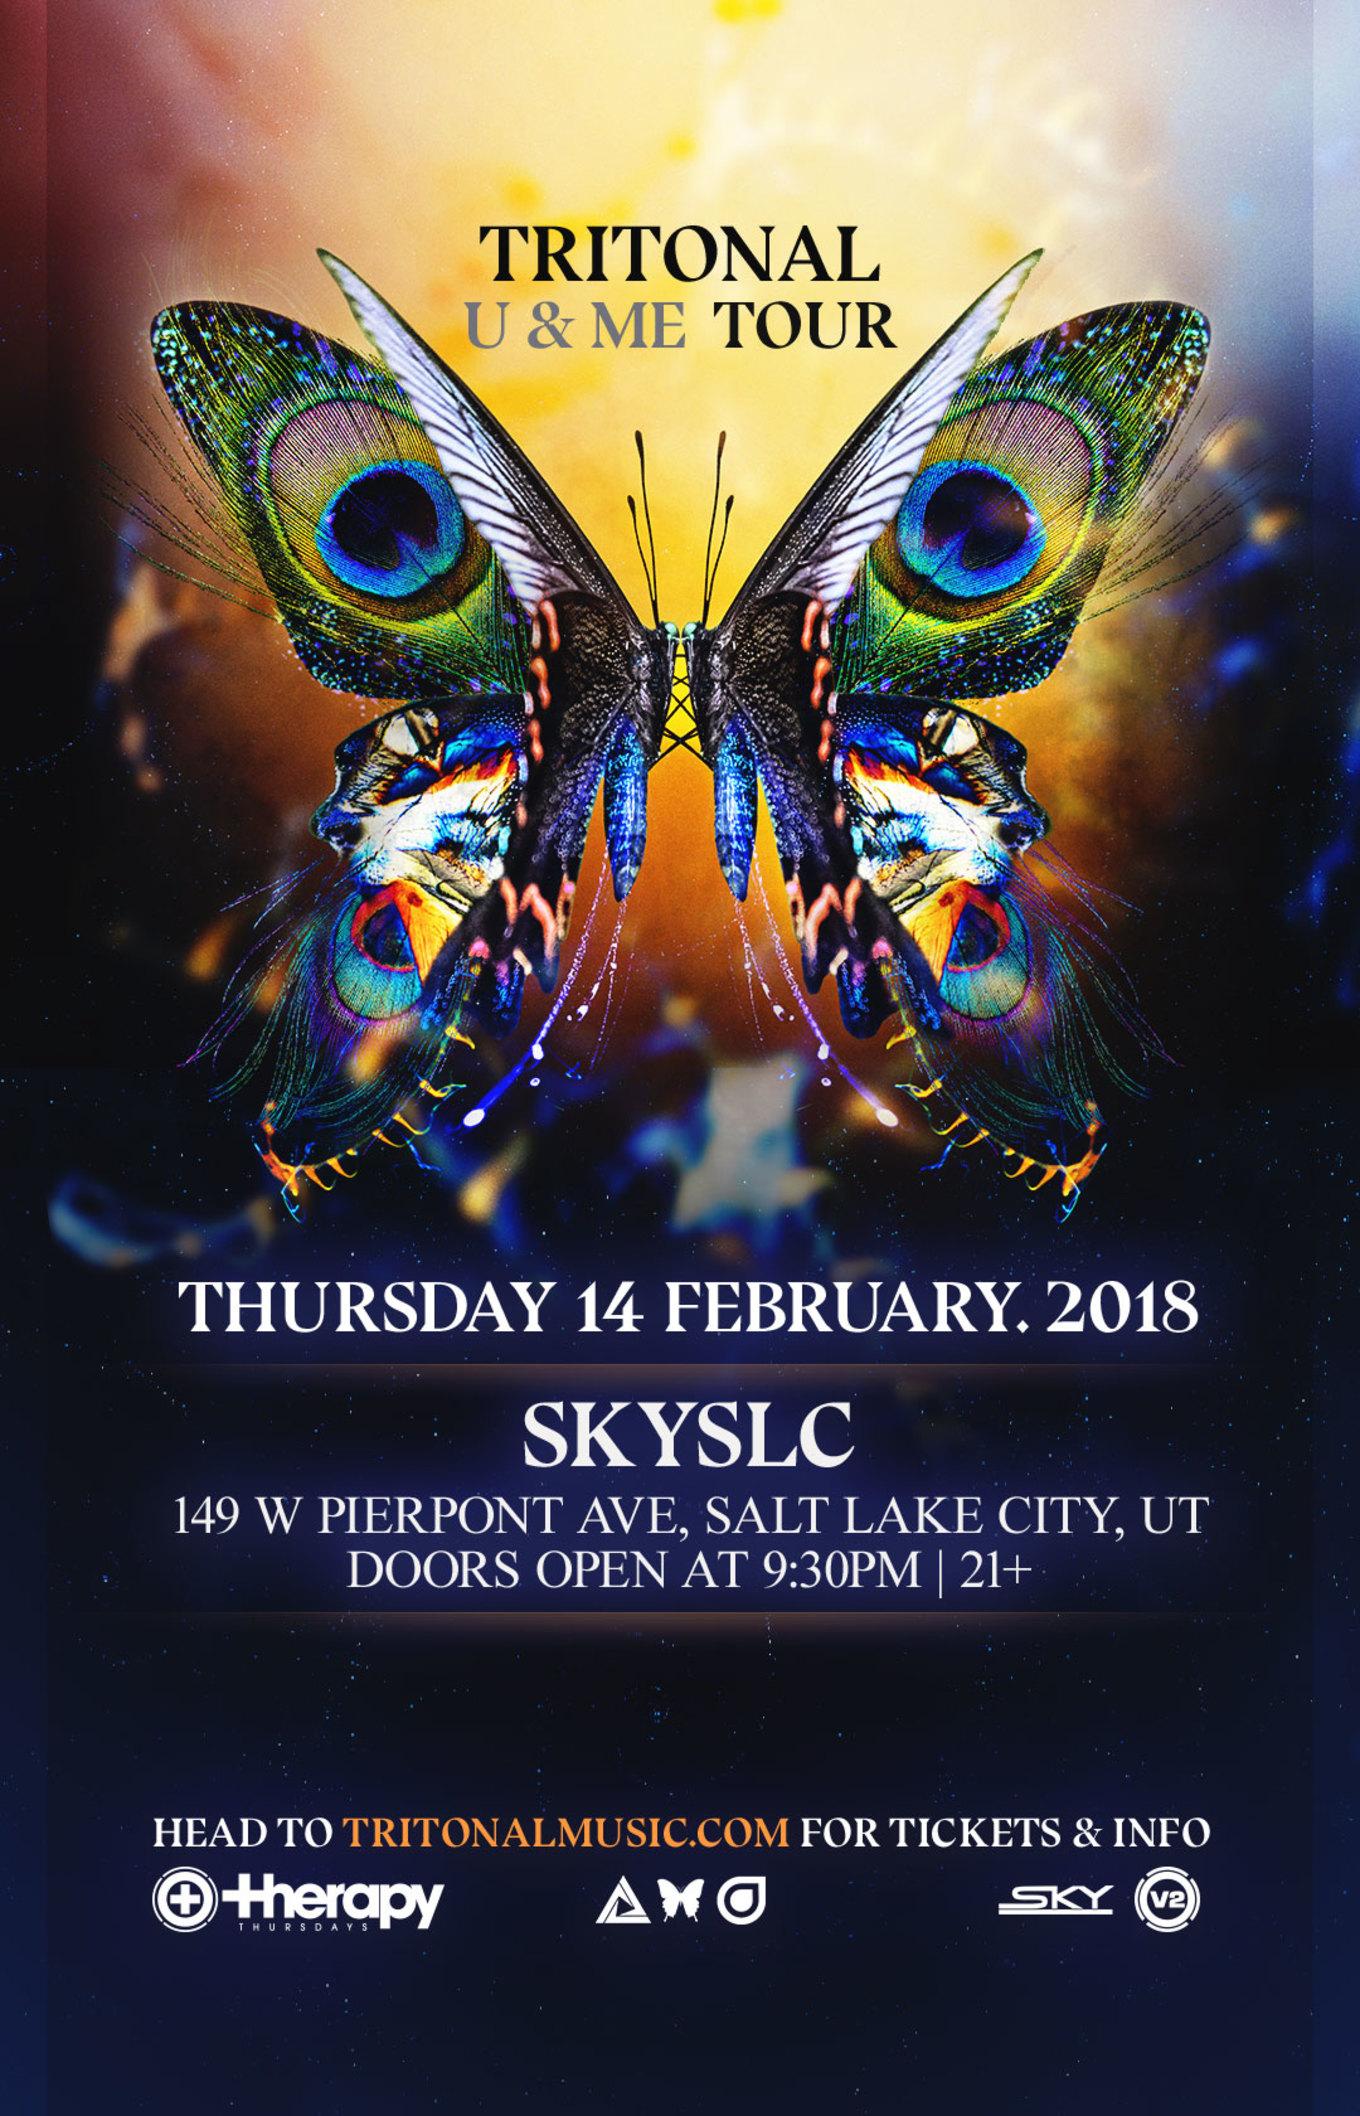 Therapy Thursdays Tritonal Ume Tour Tickets Sky Slc Salt Lake